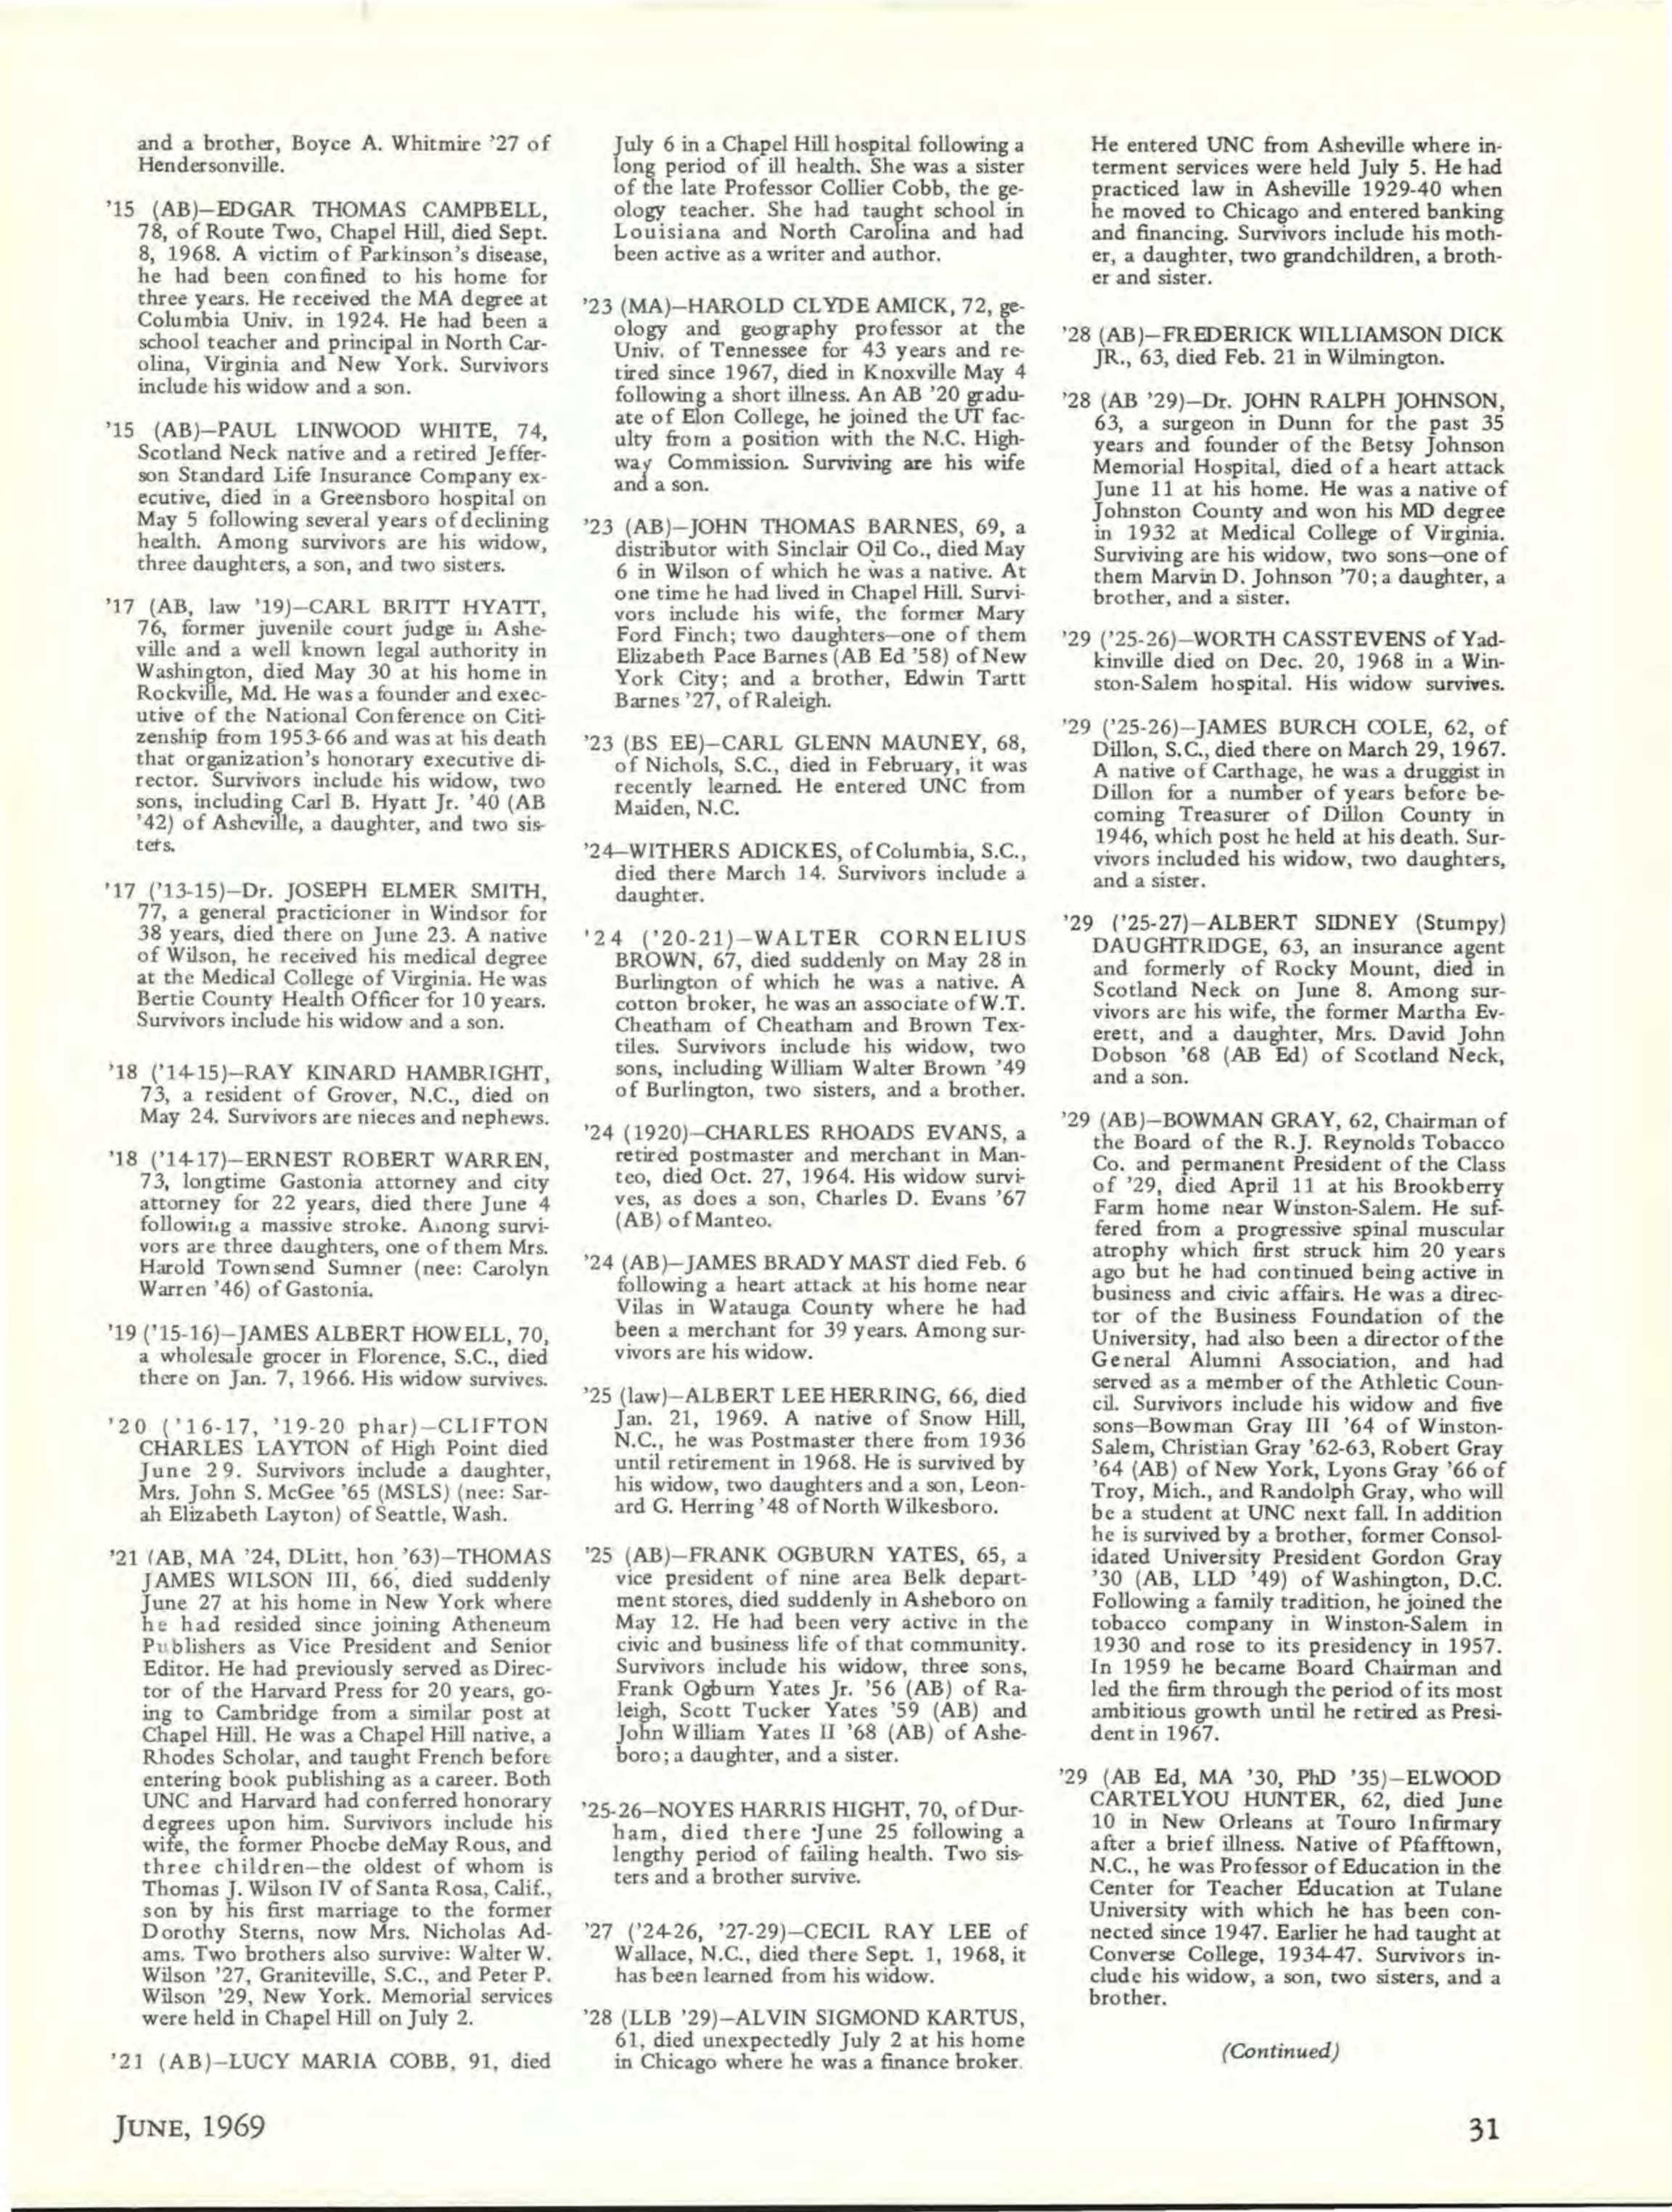 Carolina Alumni Review - June 1969 - page 32